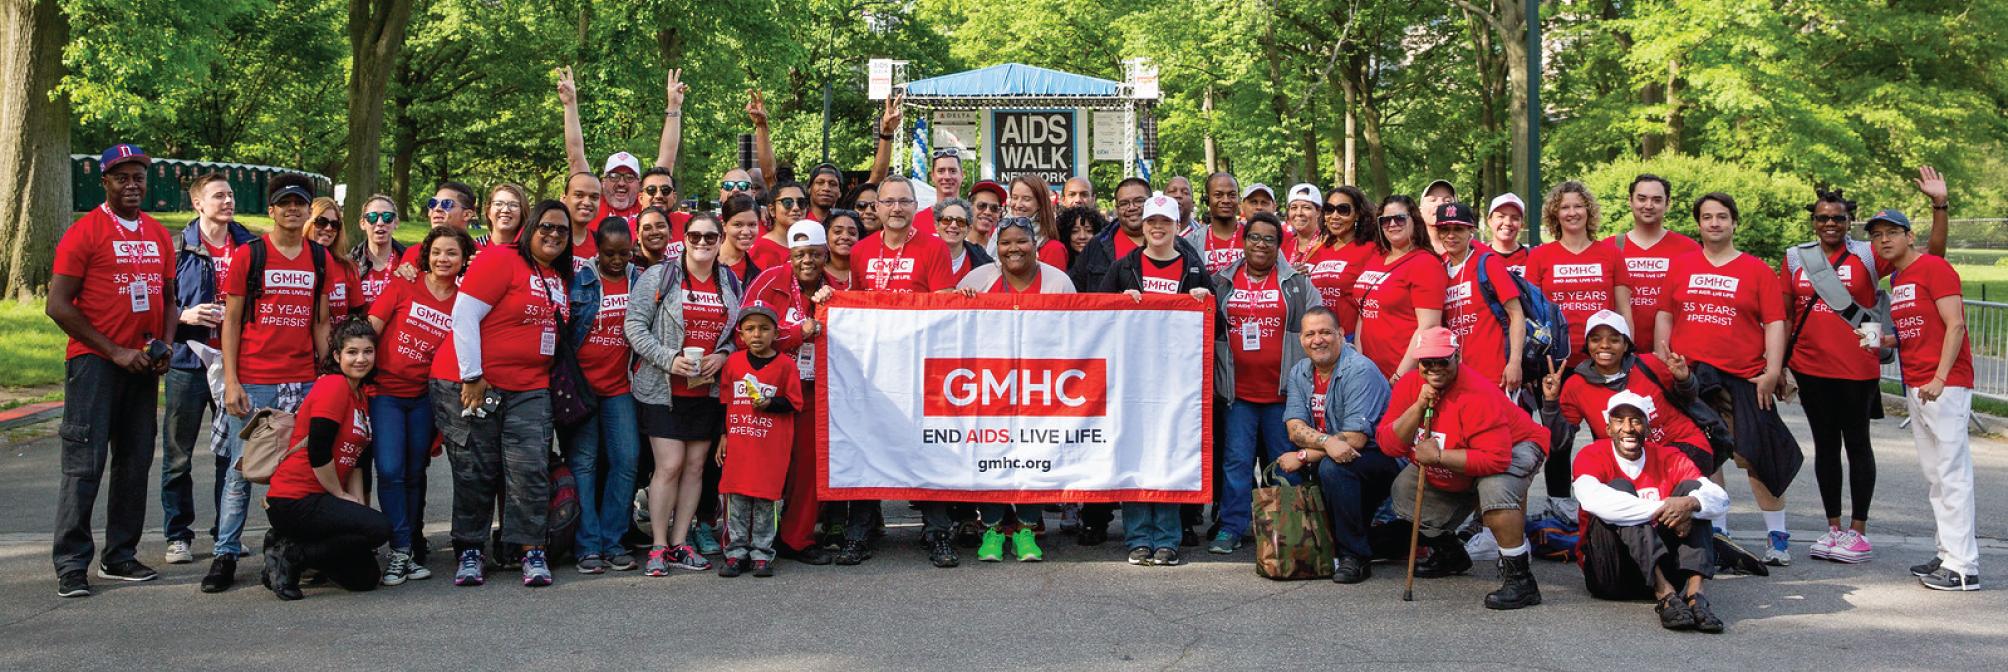 Who Benefits - AIDS Walk New York 2019